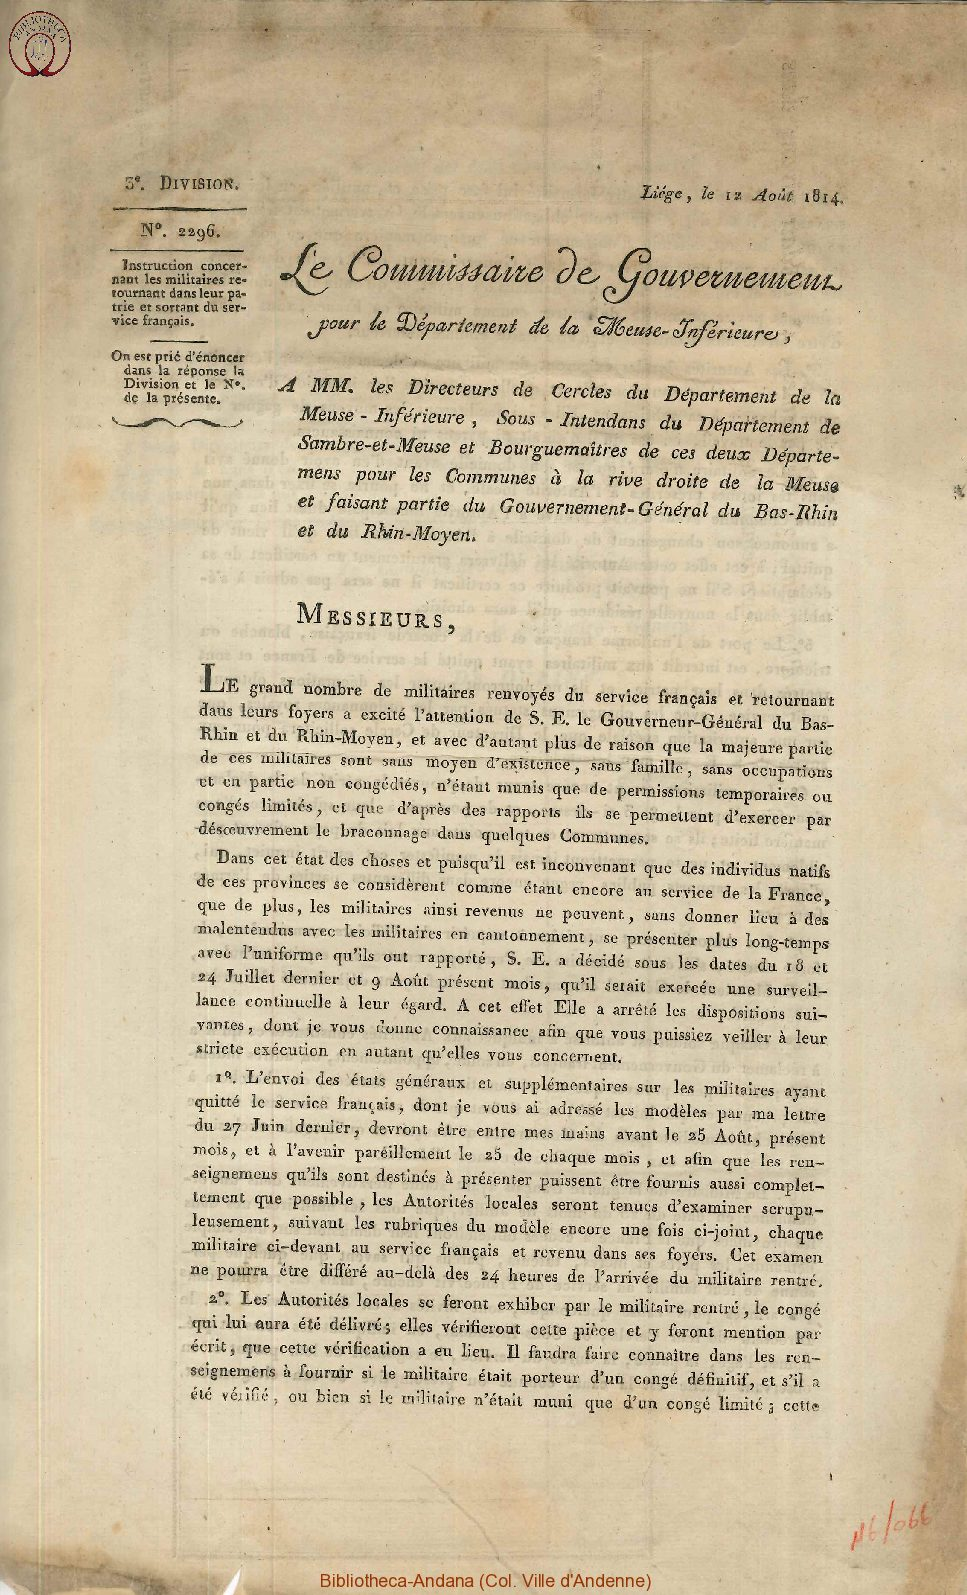 1814-08-12